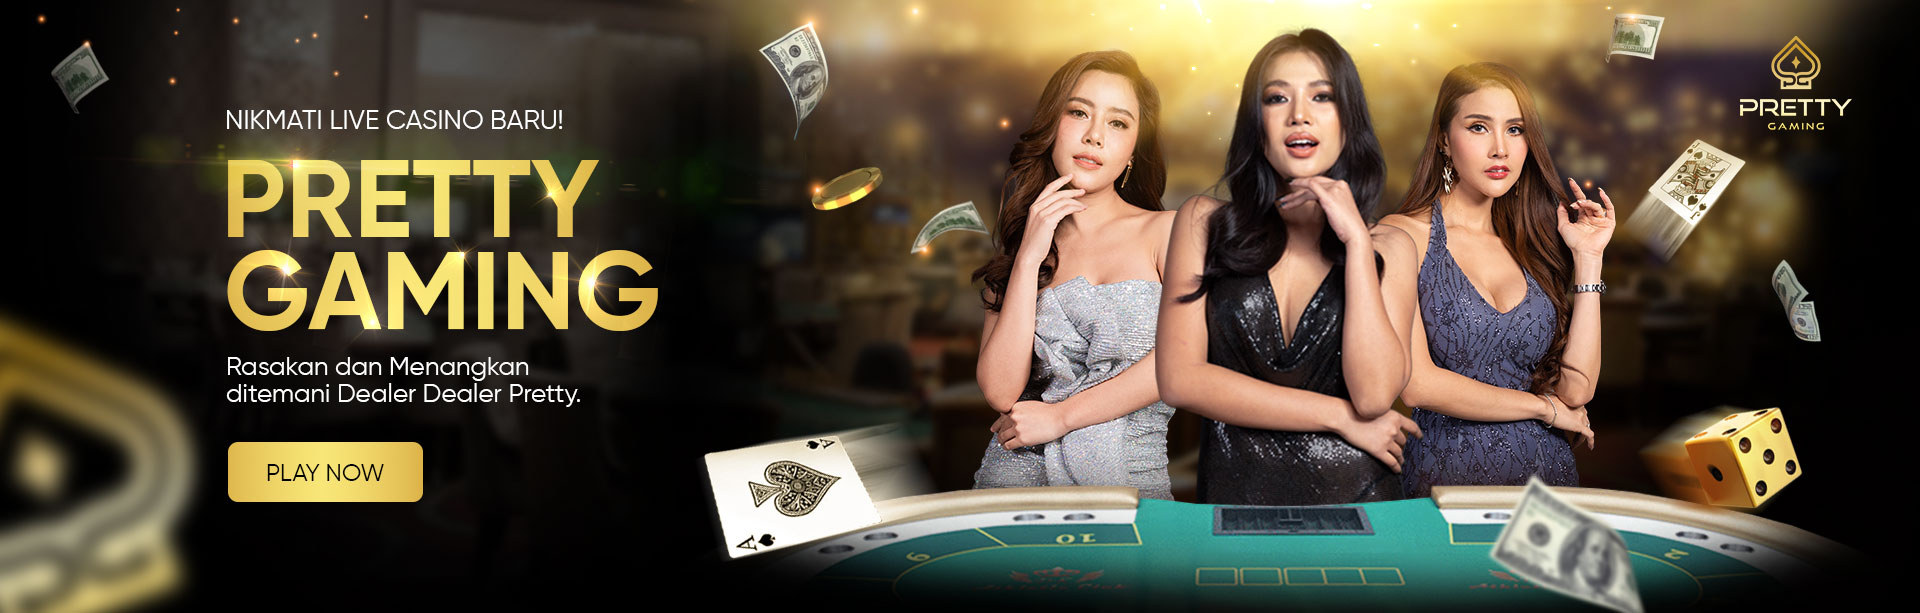 Kimikobet game terbaru live casino online pretty gaming